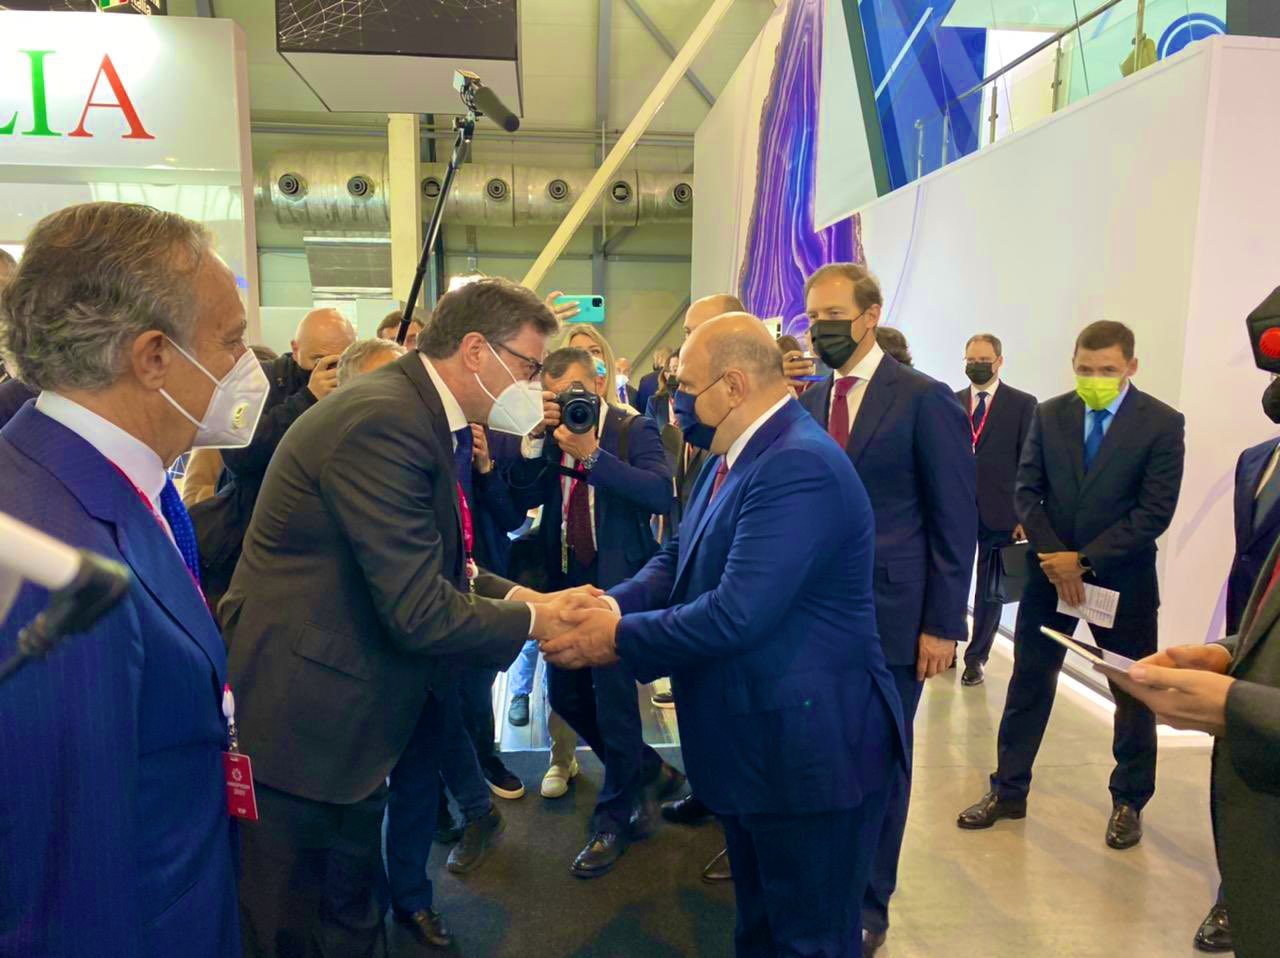 Enel、Ansaldo 和 Pirelli 將在俄羅斯做什麼(由 Giorgetti 主持)